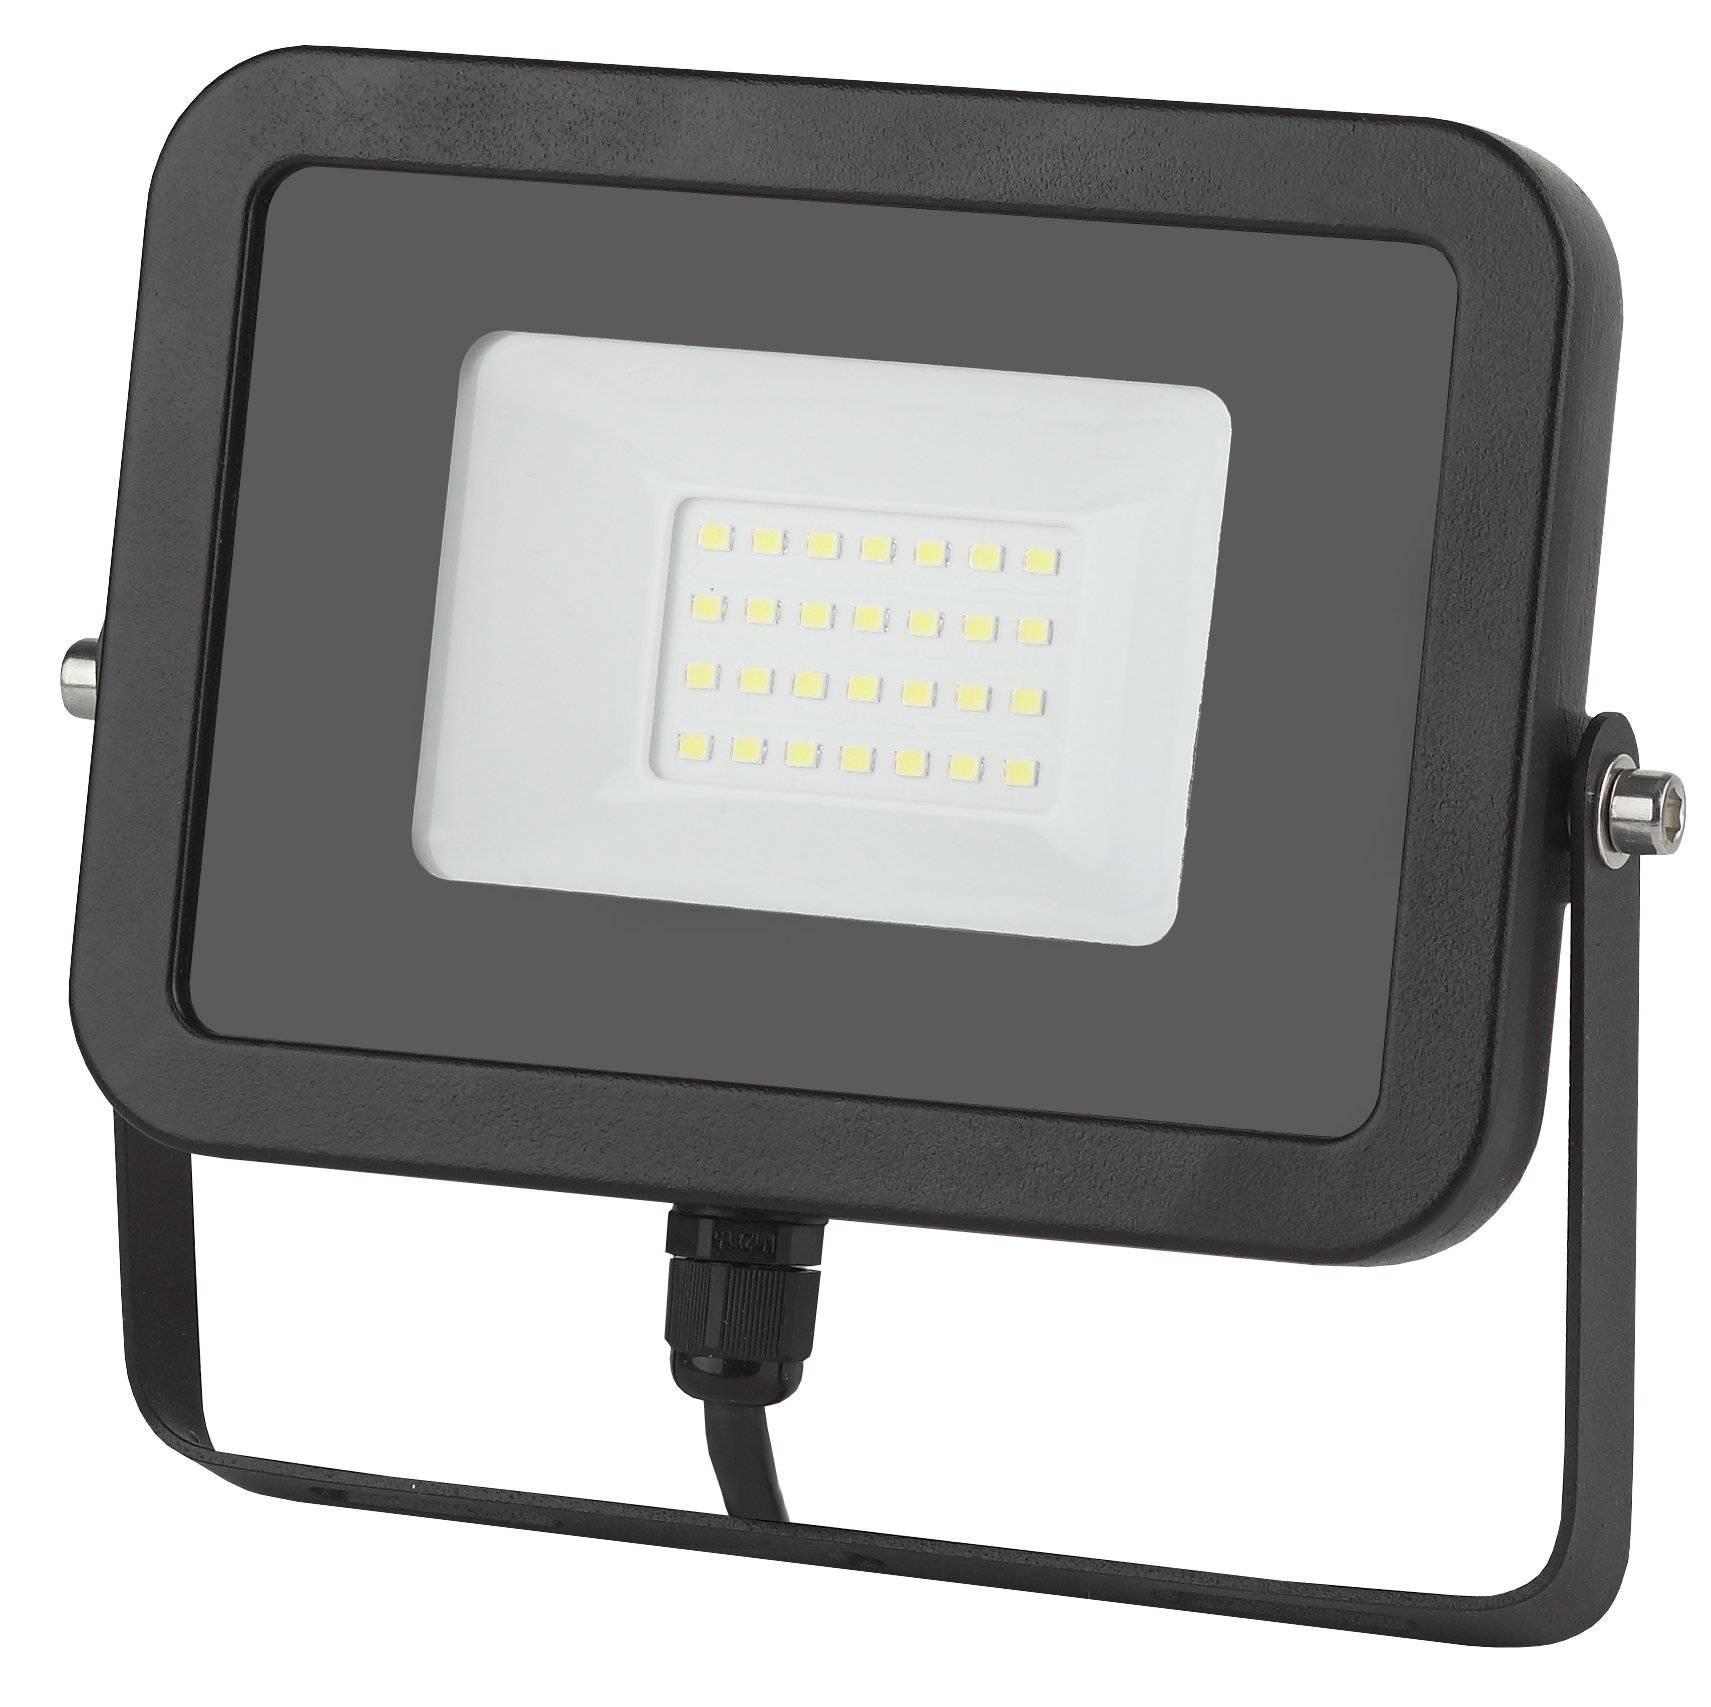 Proiector slim cu LED, 30 W, ECO LED, Gri Ieftin OEM, Vezi Pret | shopU